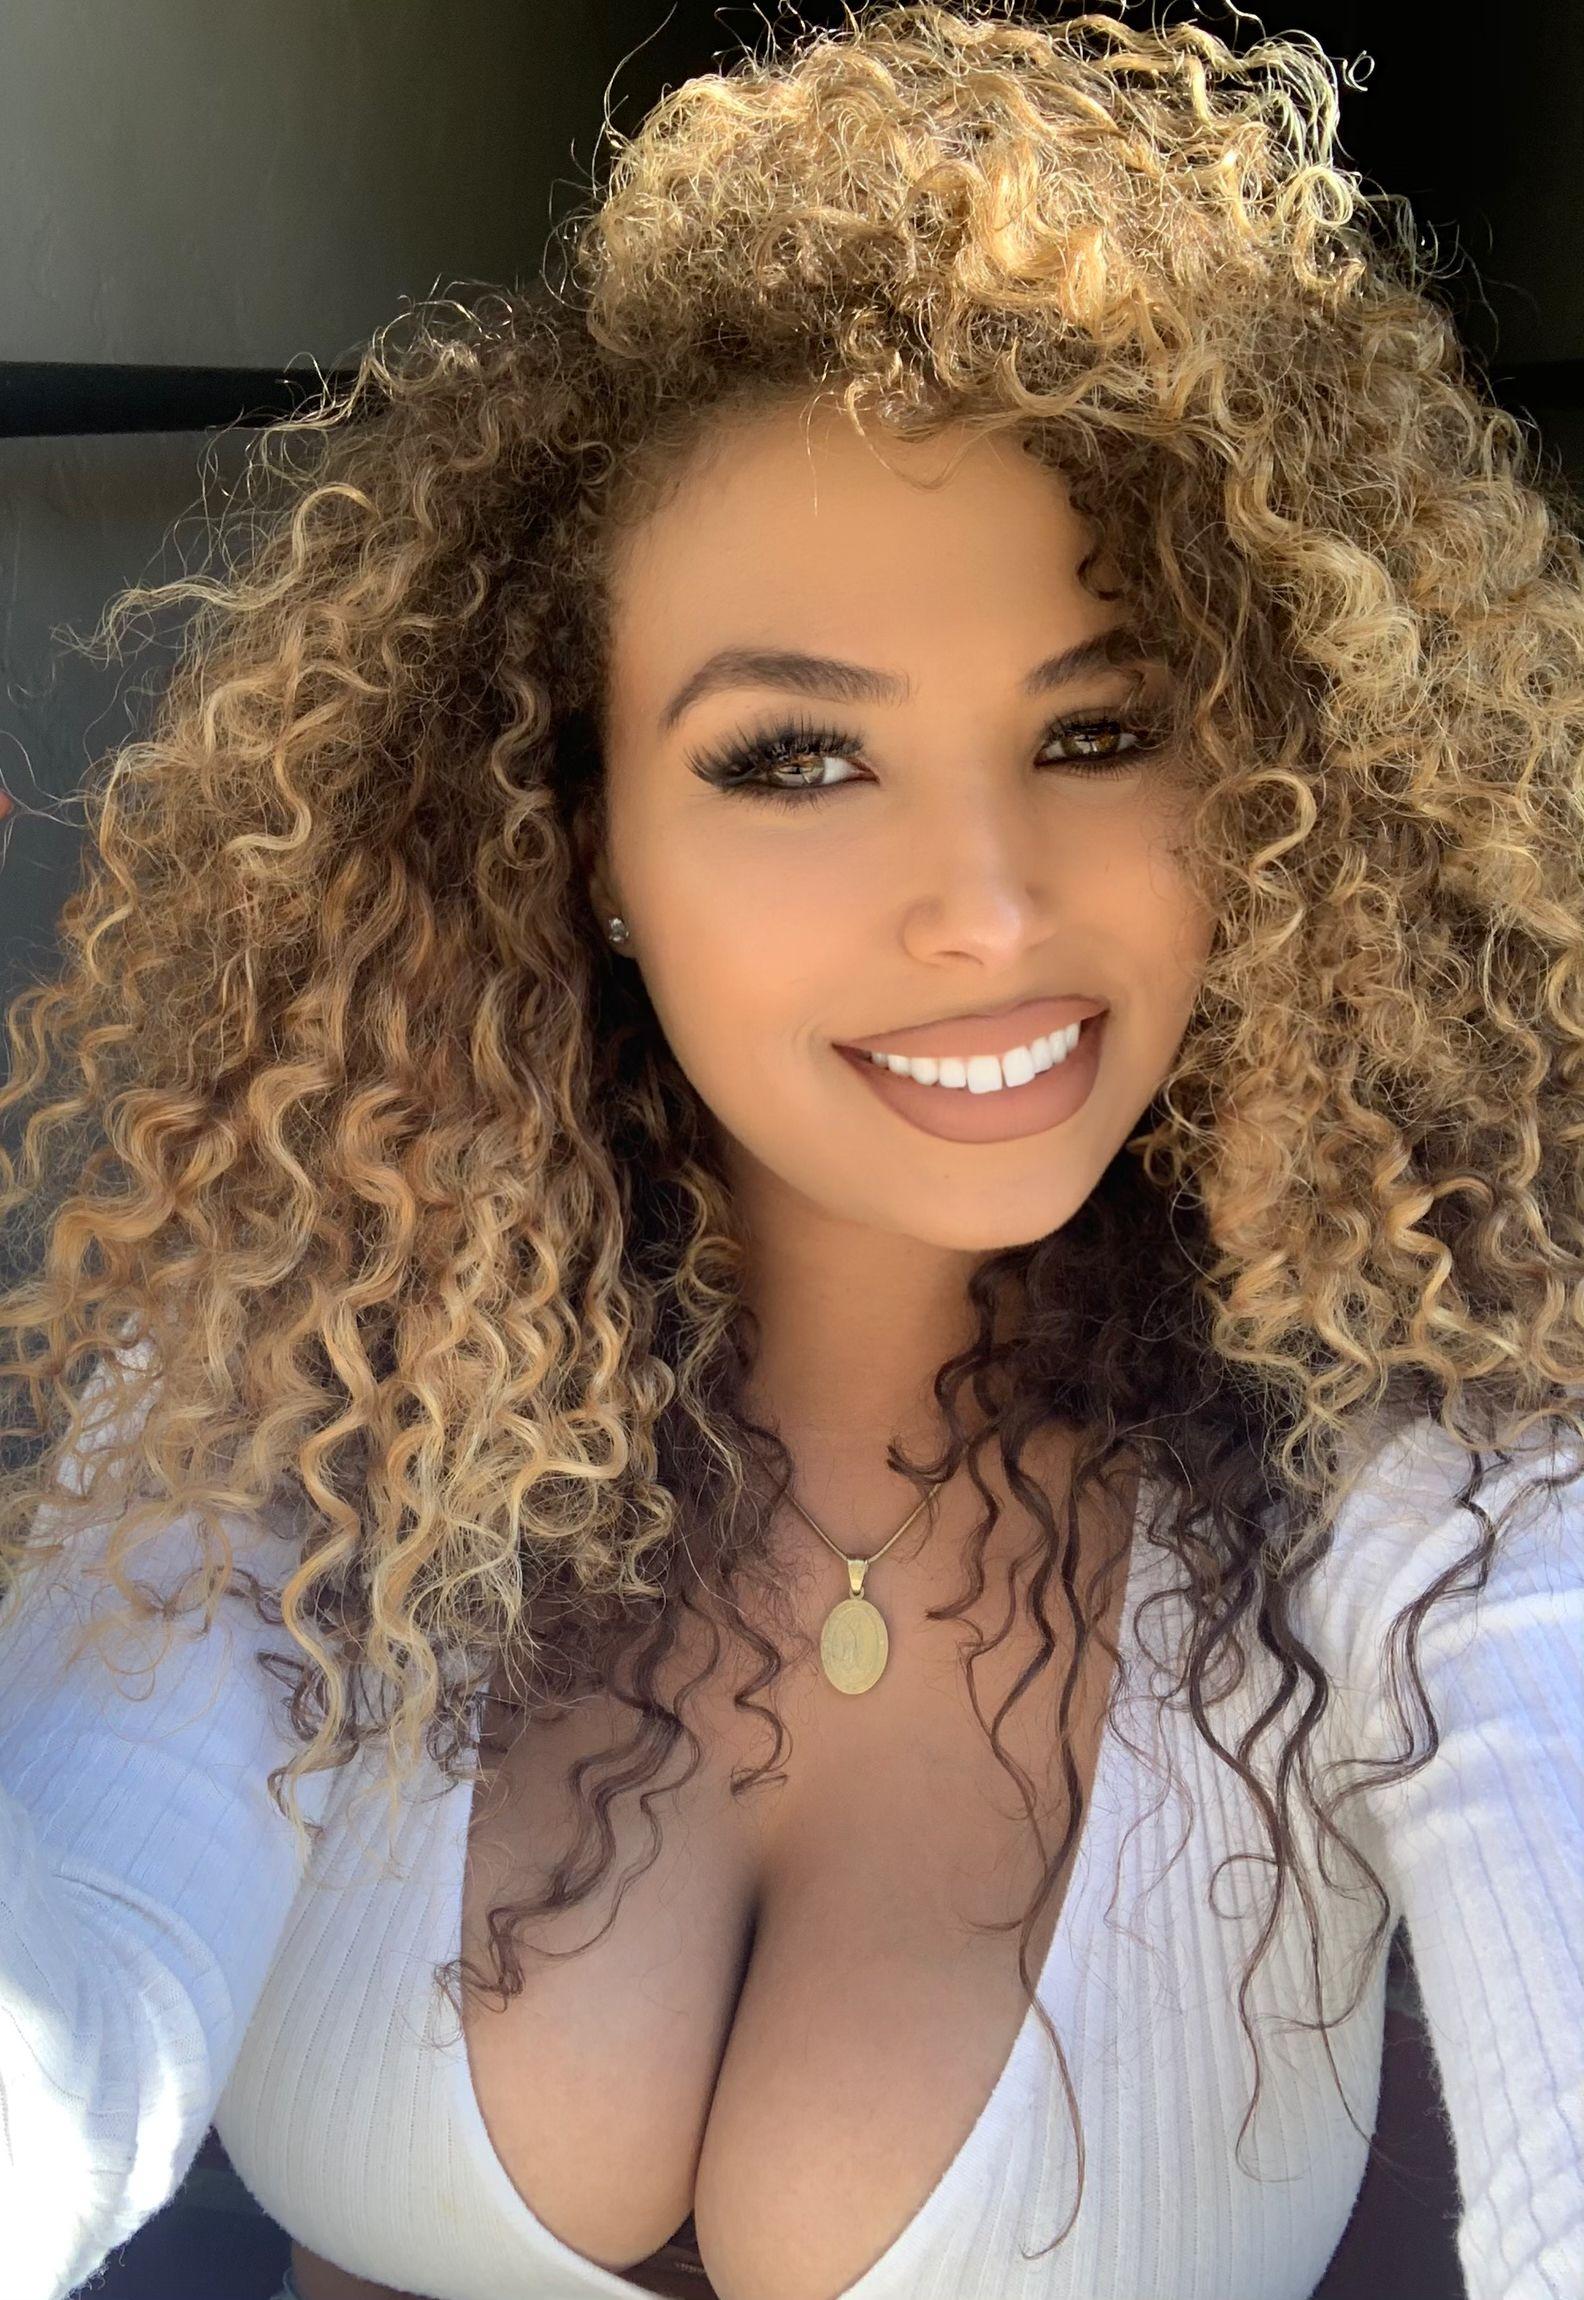 Balayage blonde curly hair blonde curly hair curly hair